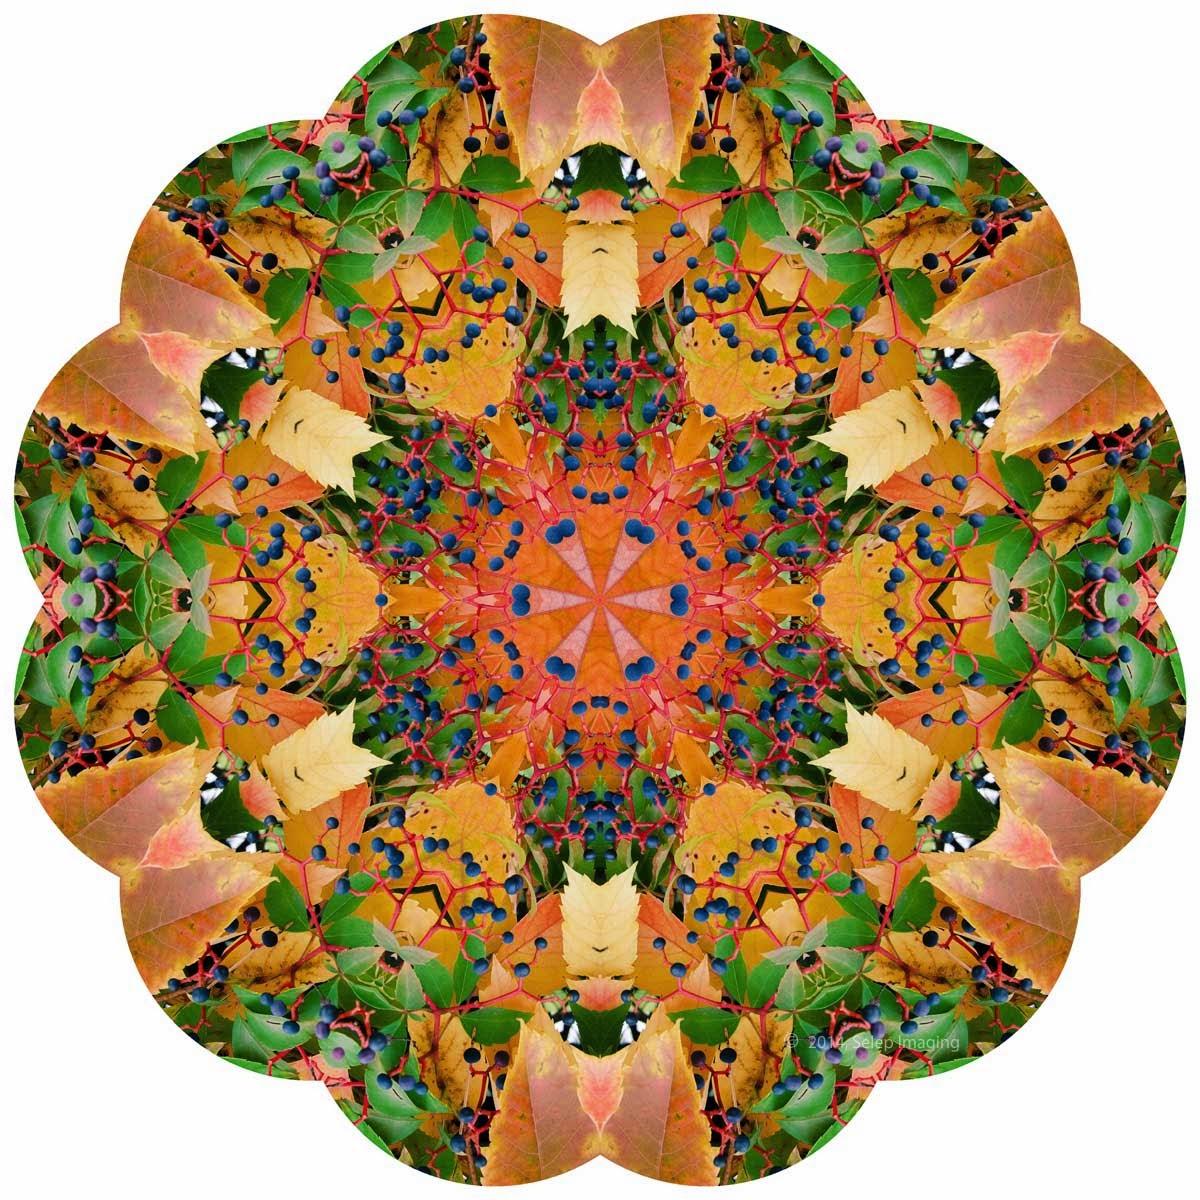 Kaleidoscope Photo Art fall by Jeanne Selep